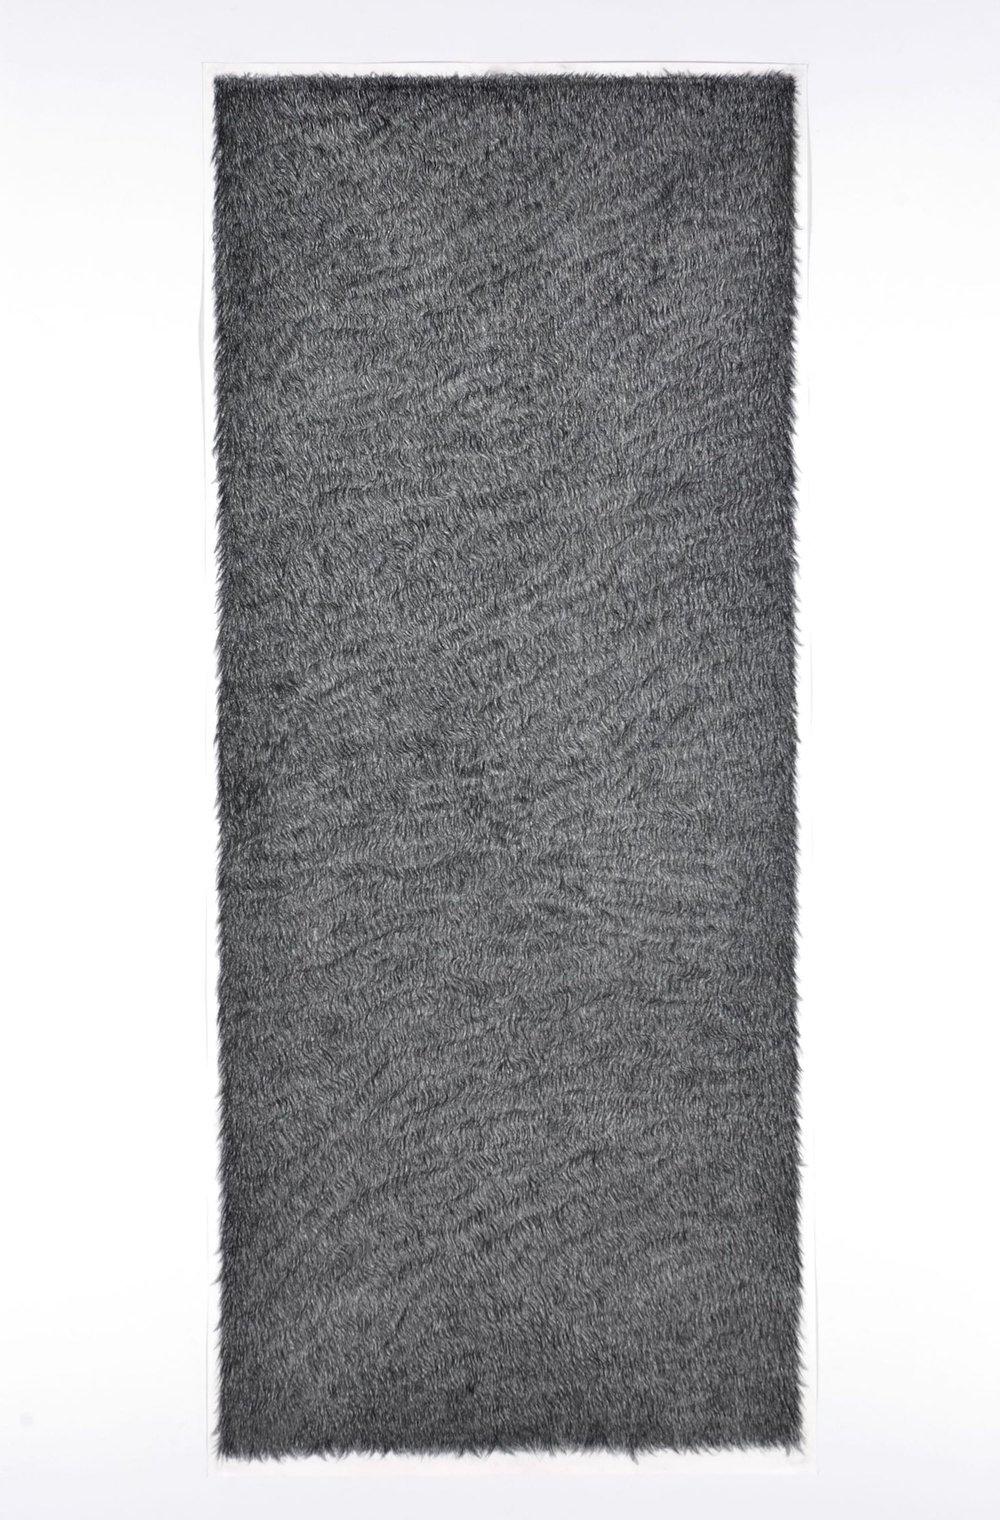 Piel 1    Carboncillo sobre papel    213 x 92 cm.2004